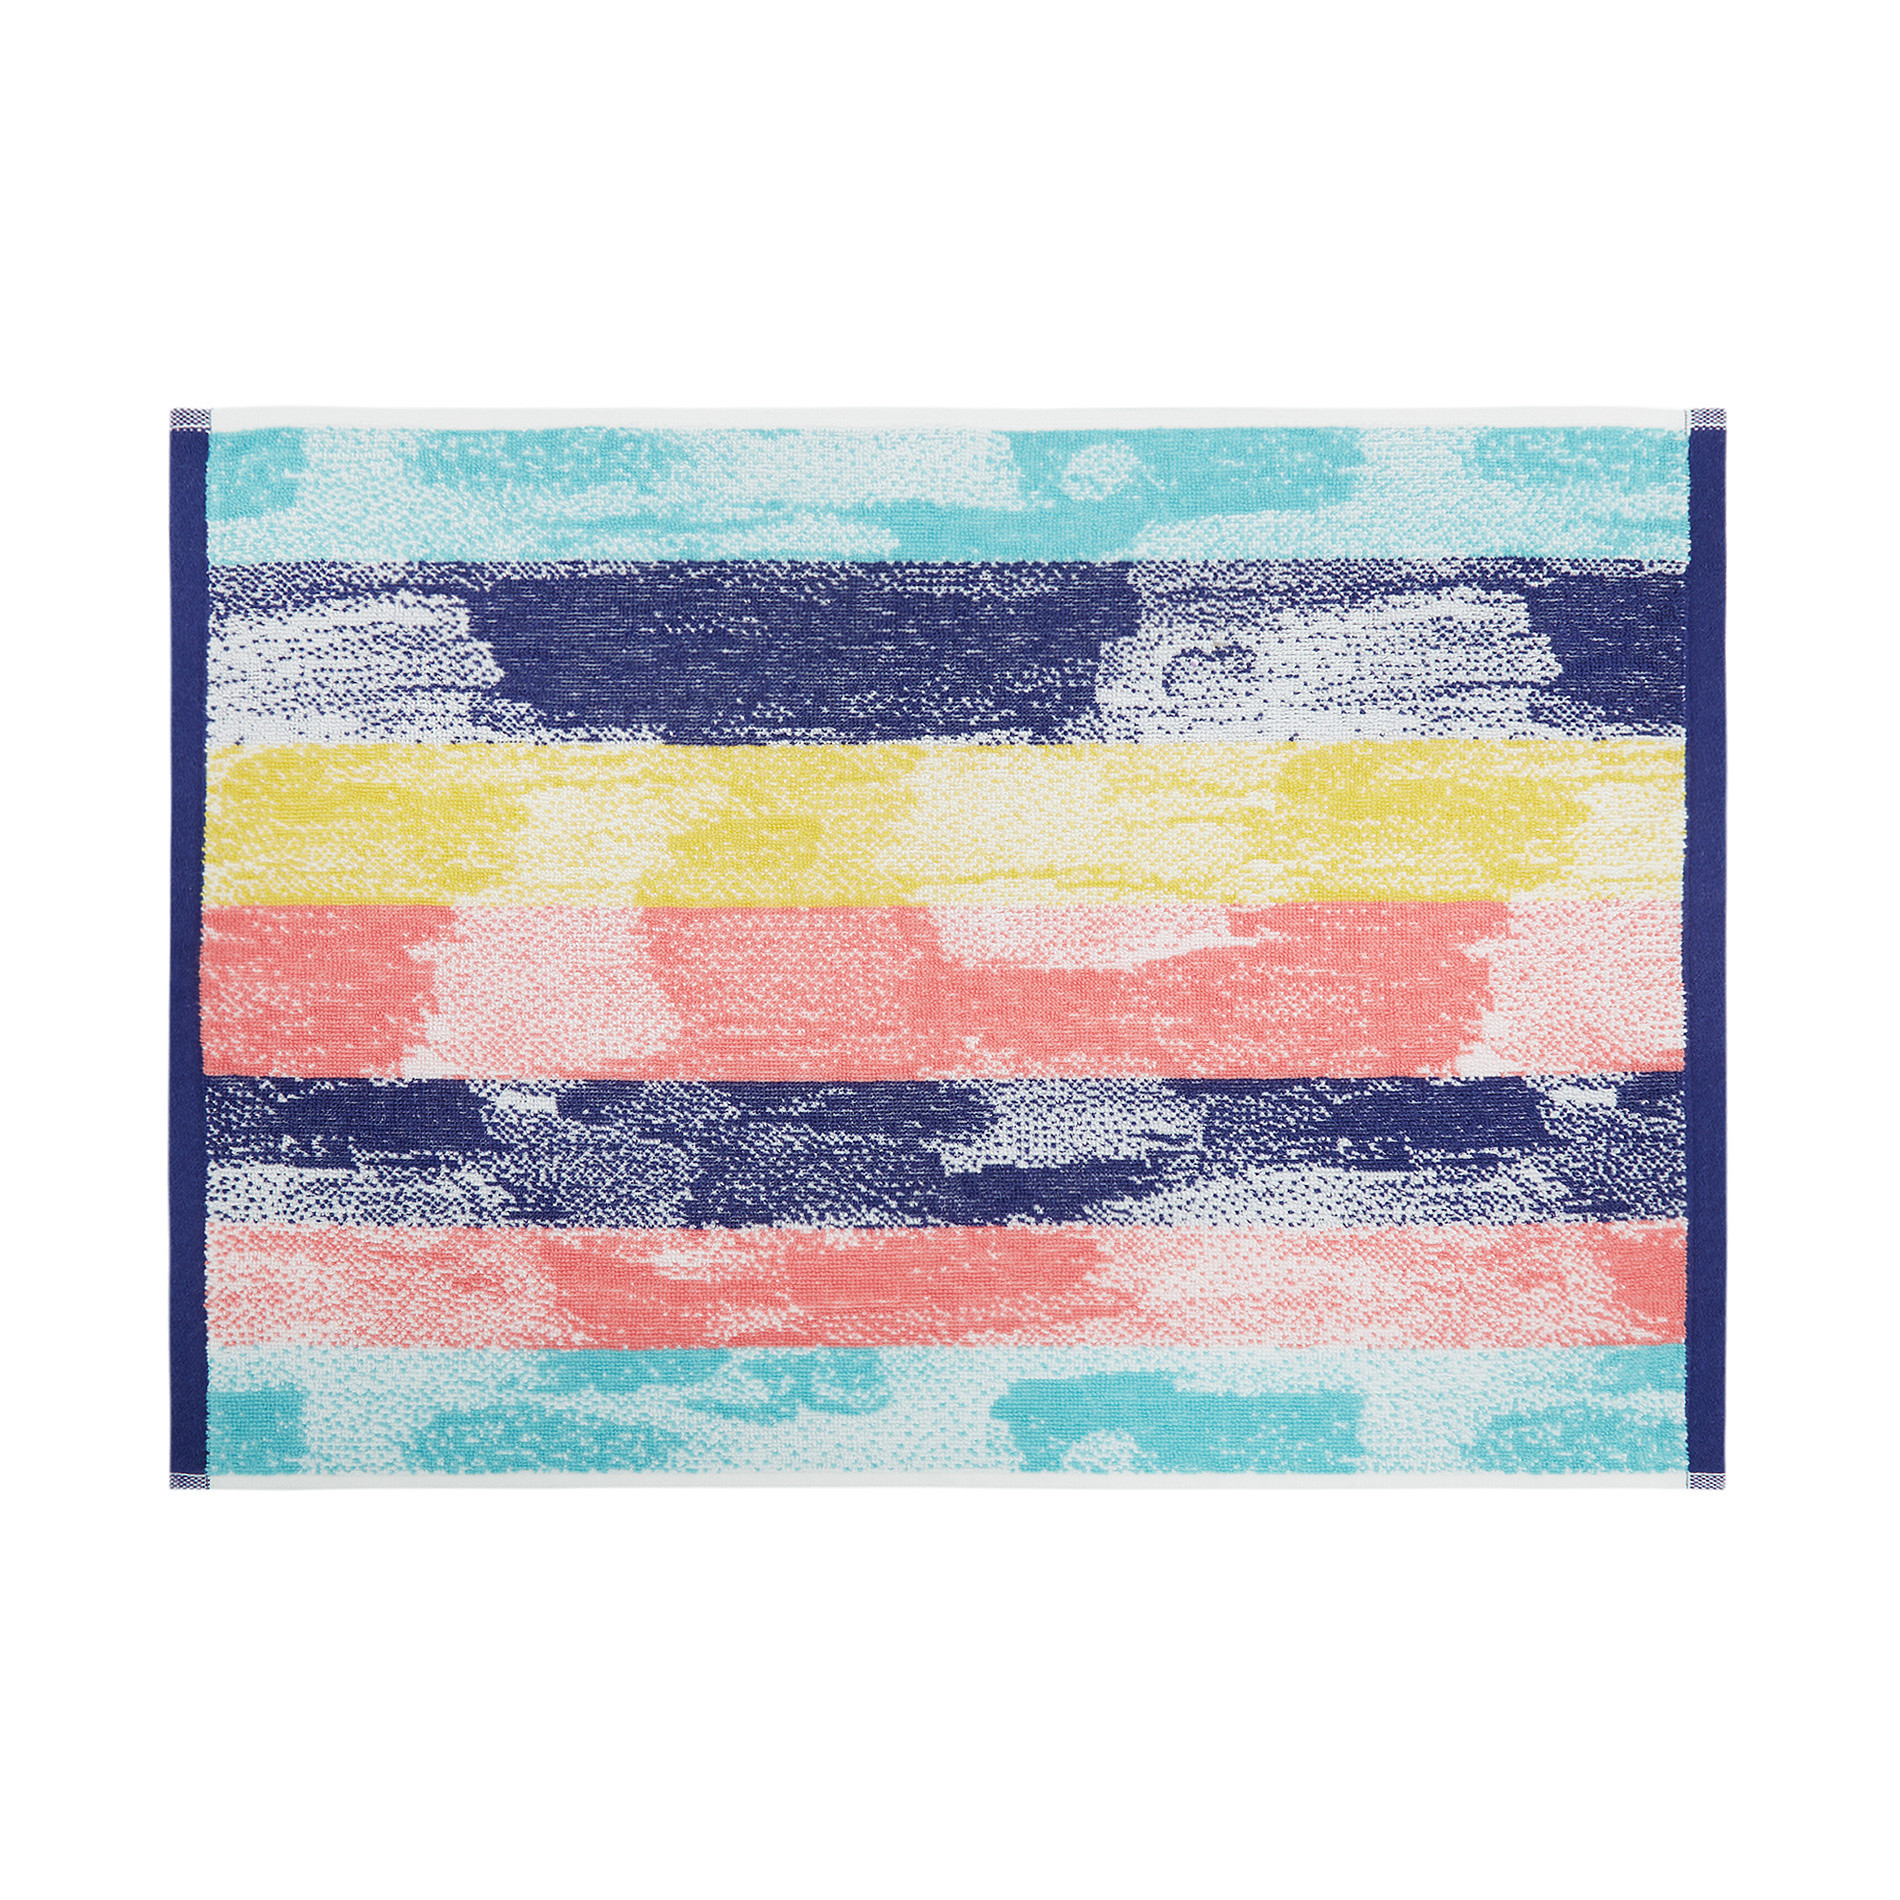 Asciugamano spugna di cotone fantasia pennellate, Multicolor, large image number 2